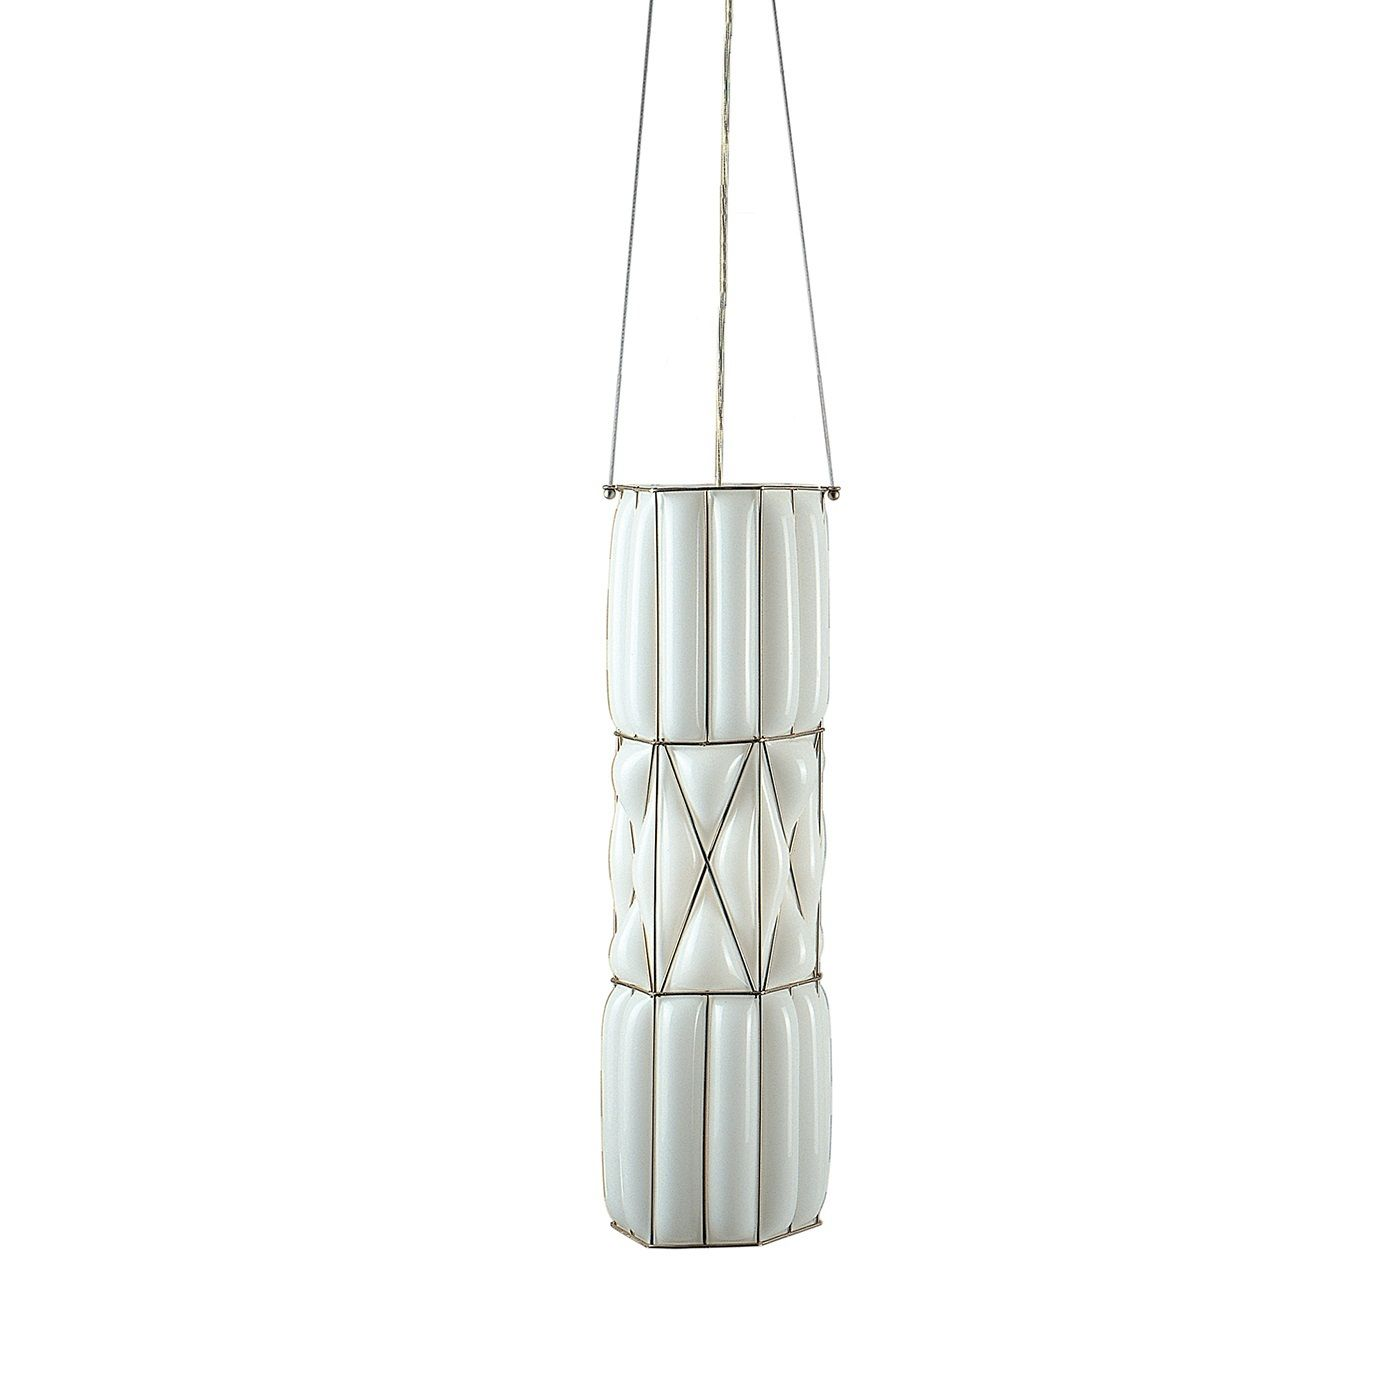 Eclissi Ceiling Lamp - Shop Siru Illuminazione online at Artemest ...